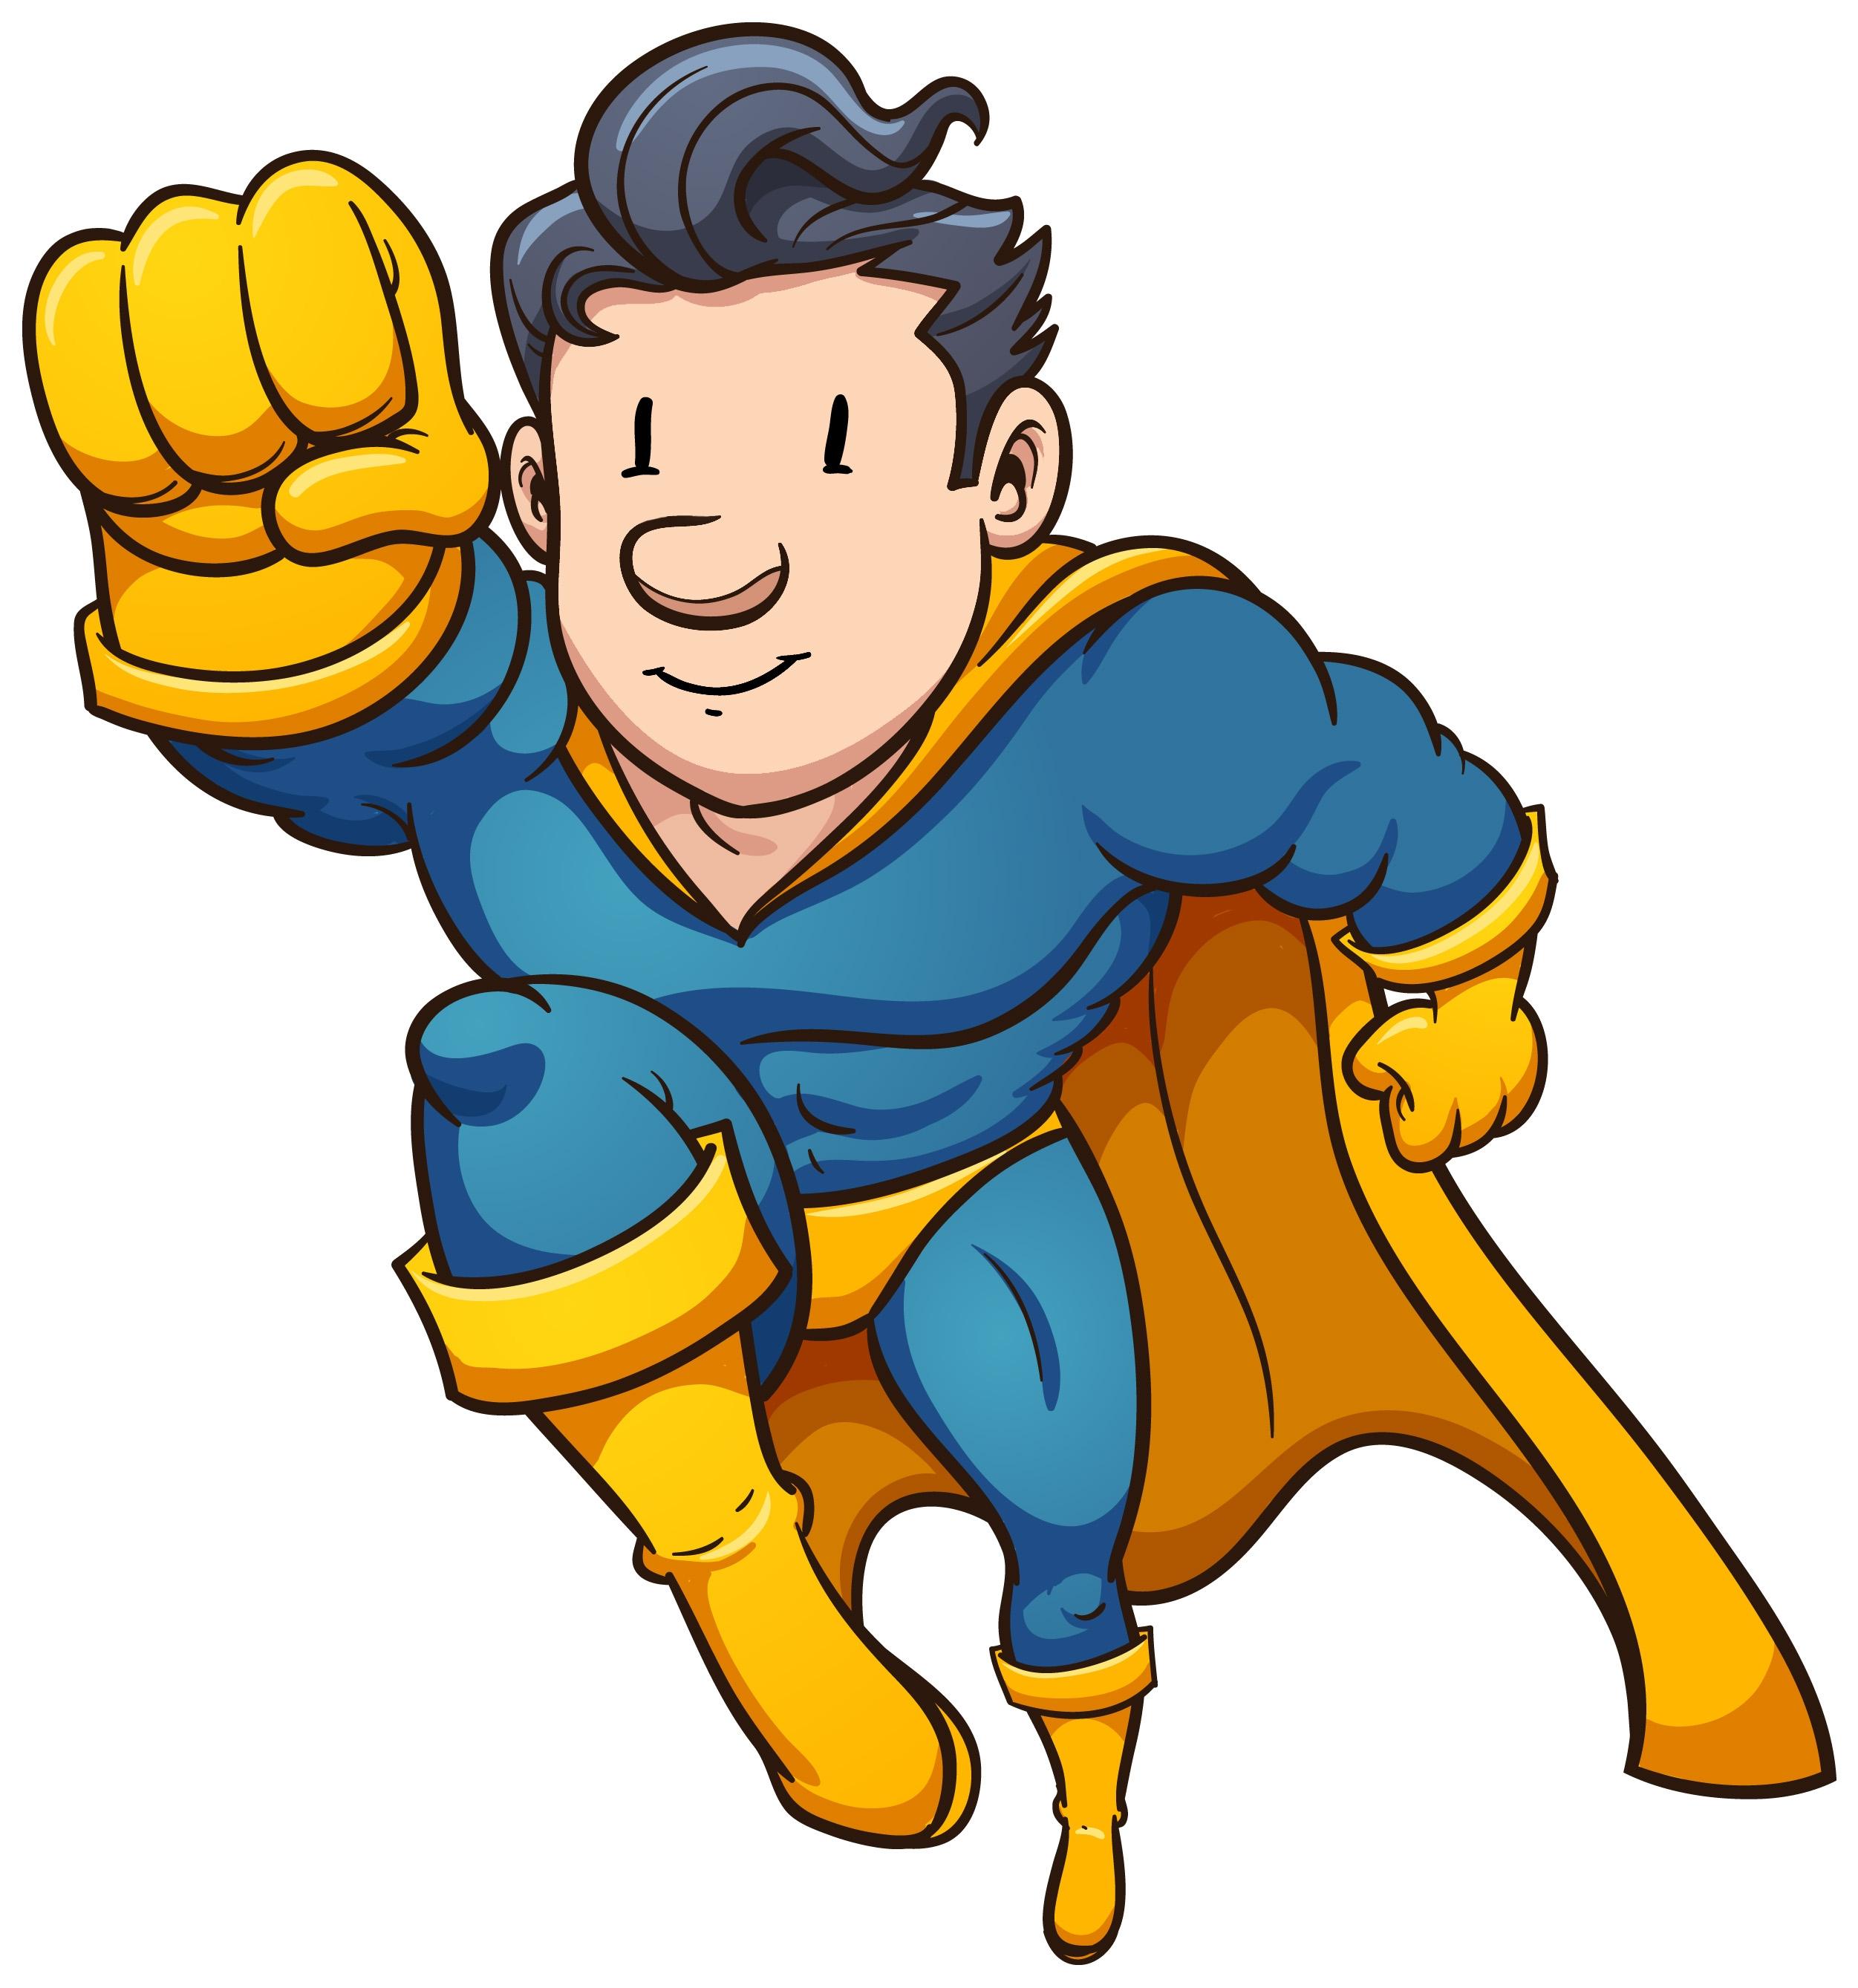 Free Superhero Clip Art Border-Free Superhero Clip Art Border-11